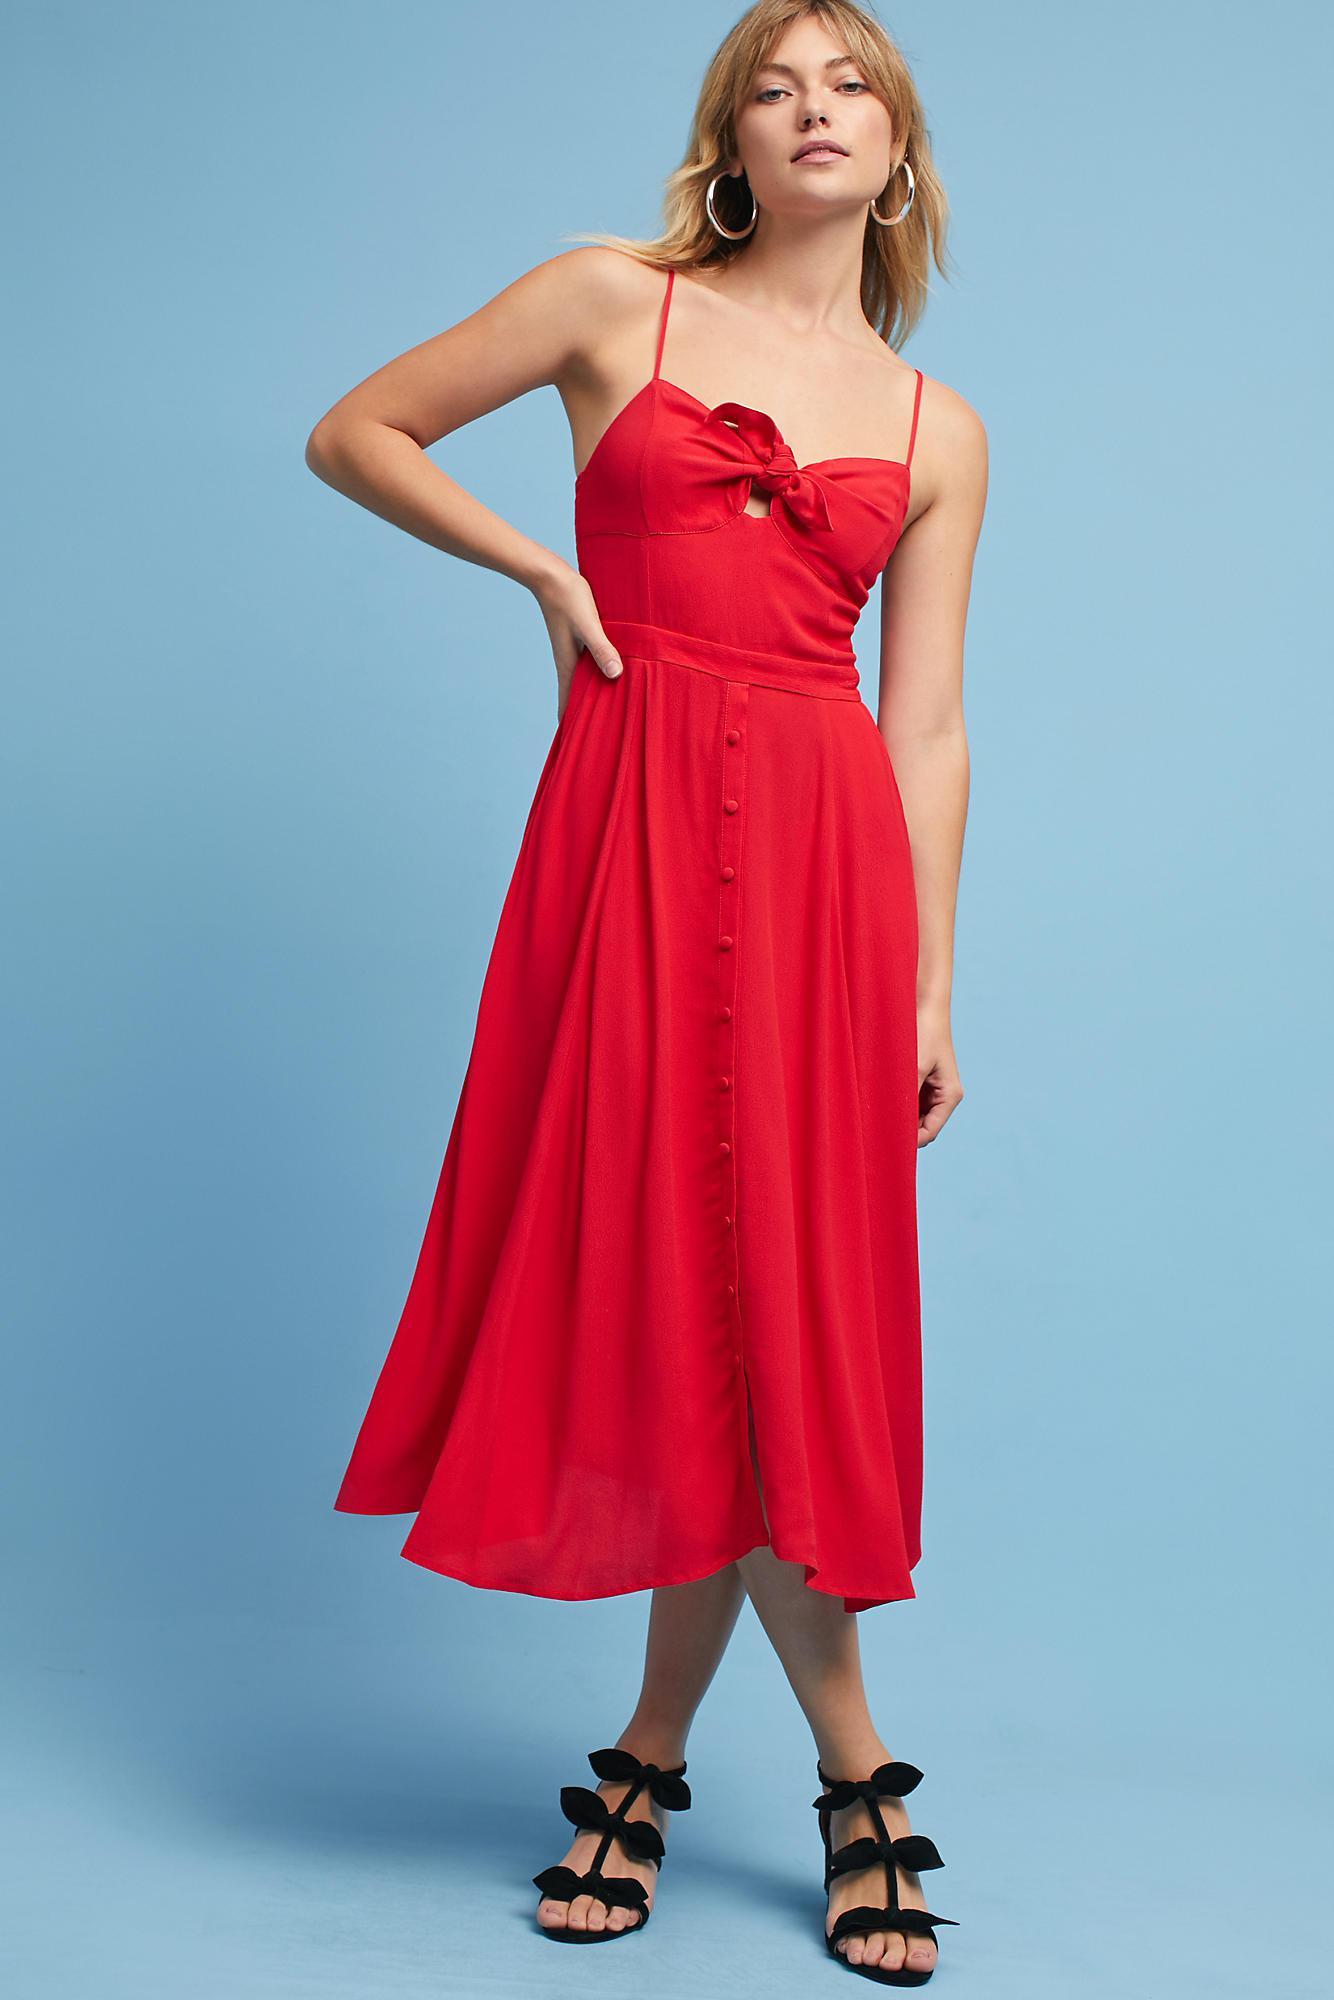 Lyst - Yumi Kim Desma Tie-front Dress in Red